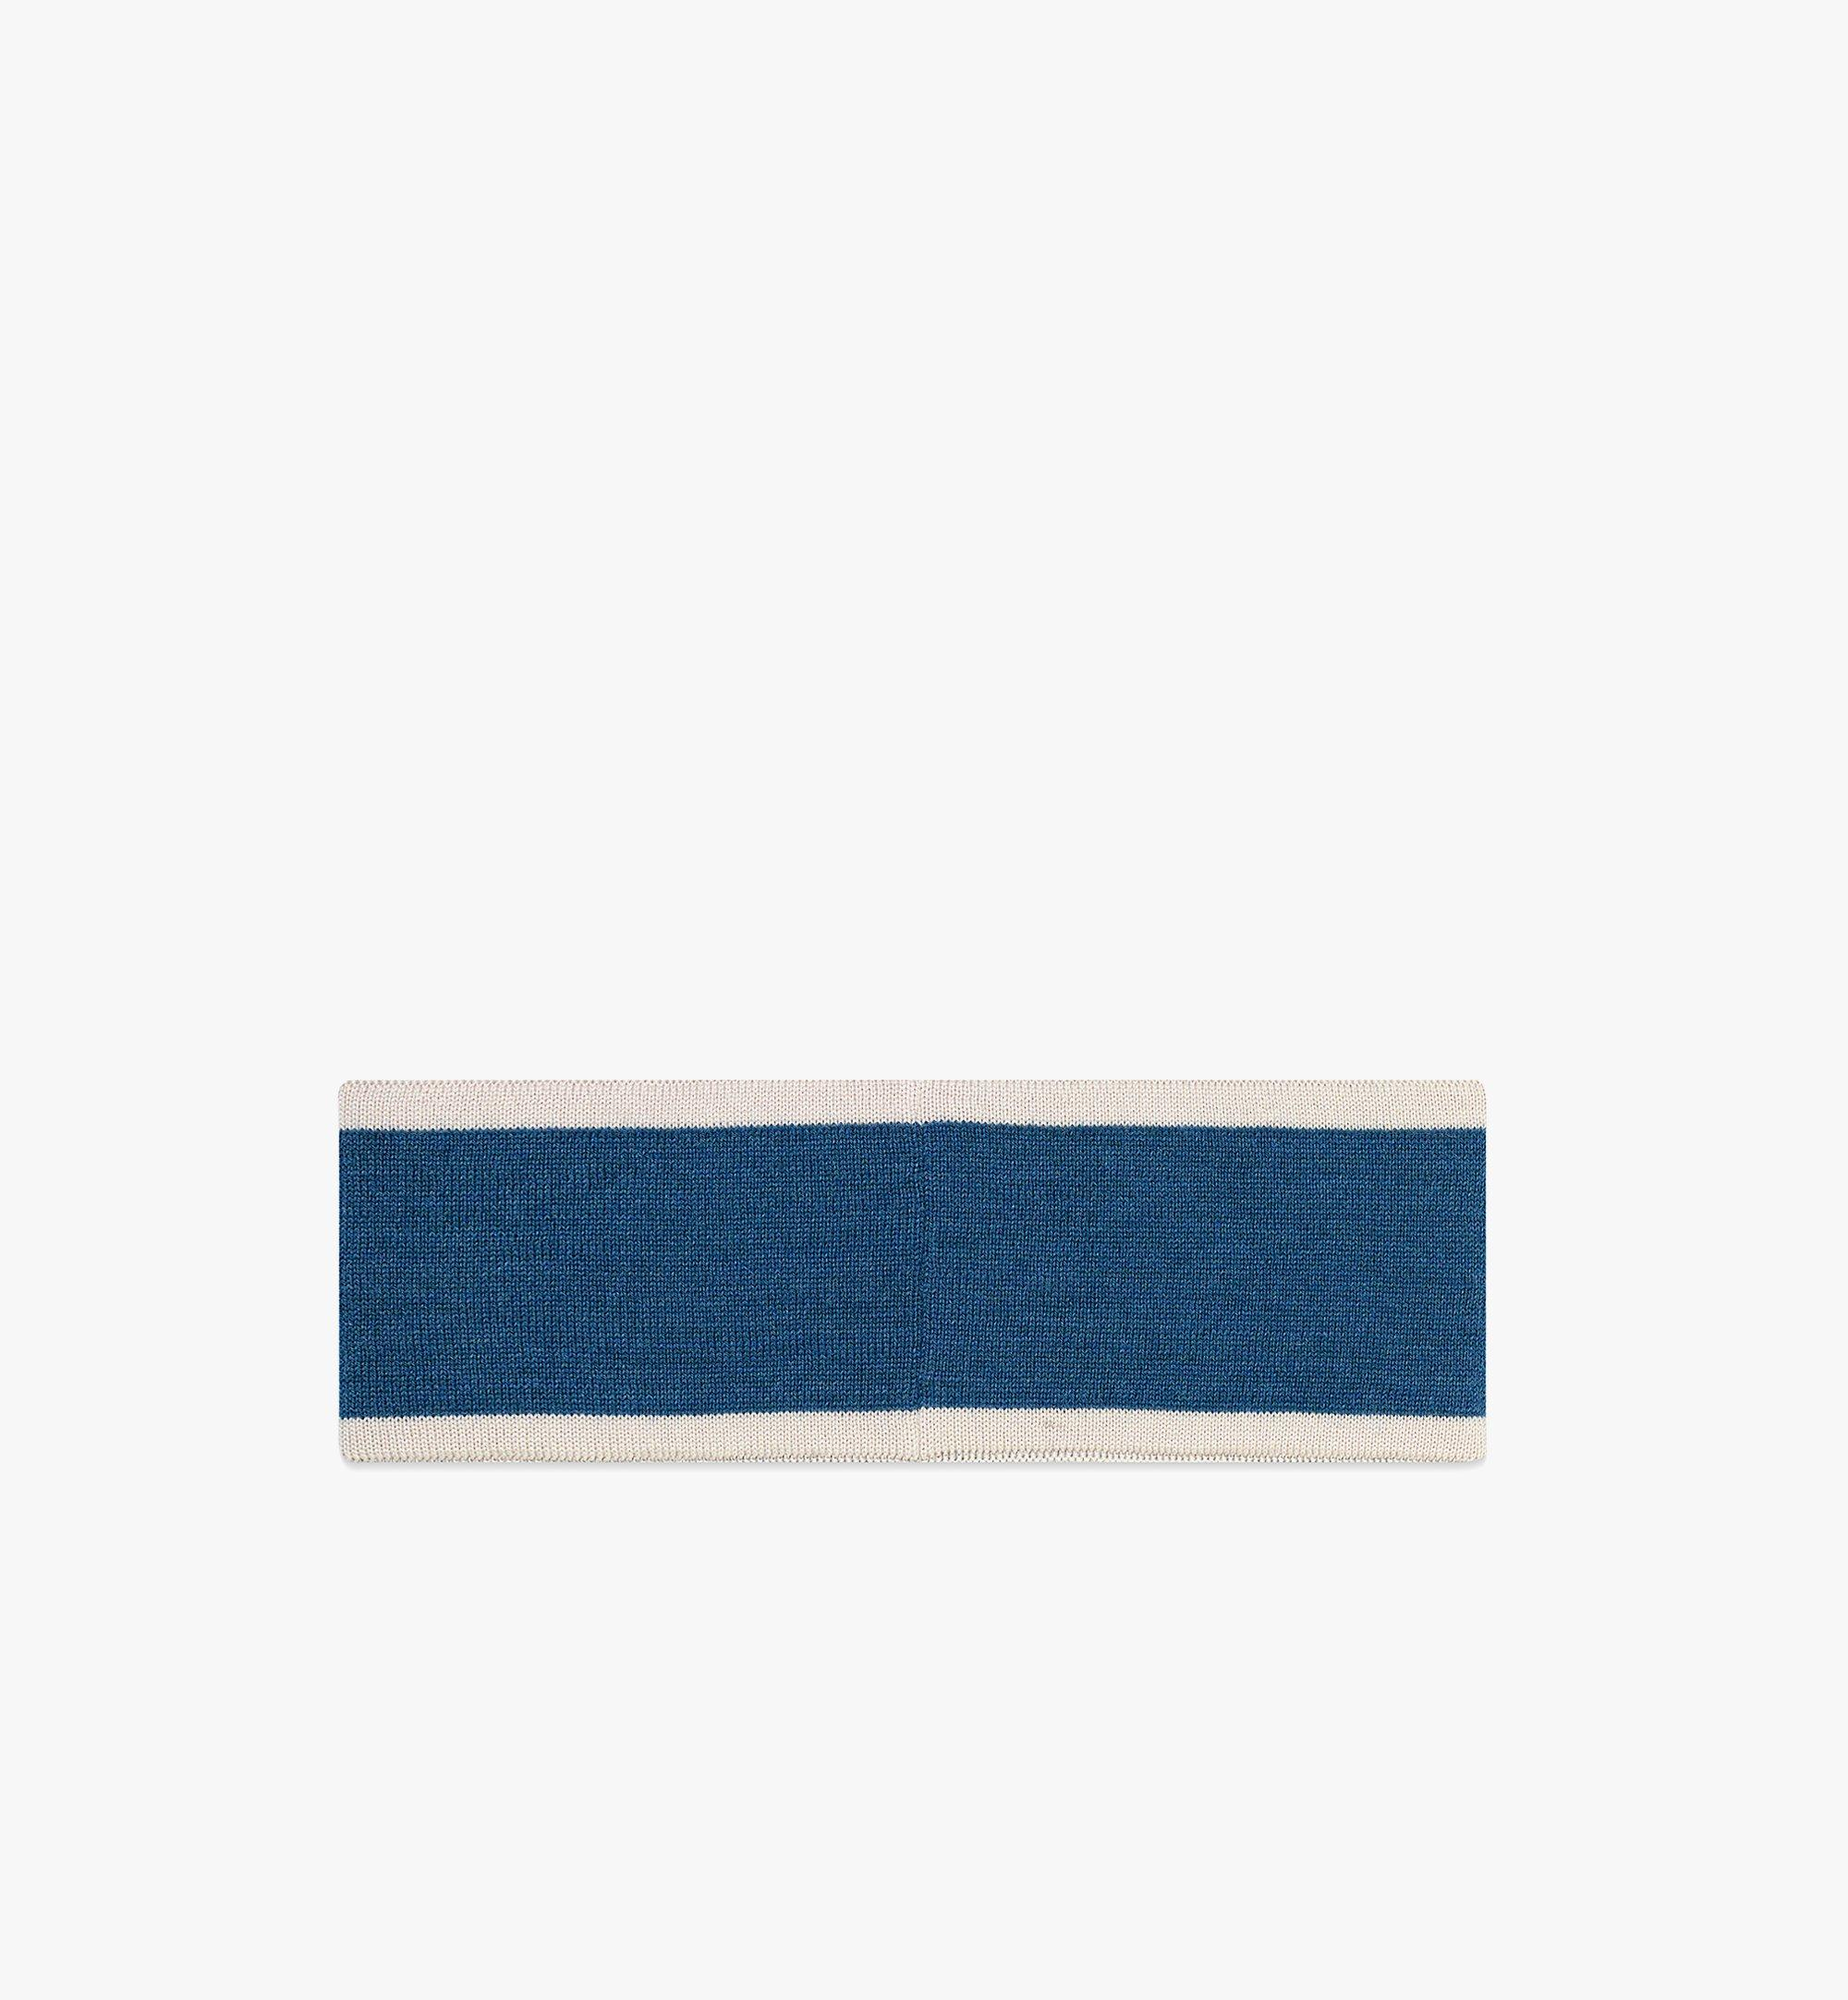 MCM 빈티지 로고 울 헤드밴드 Blue MEHBATQ02LU001 다른 각도 보기 1